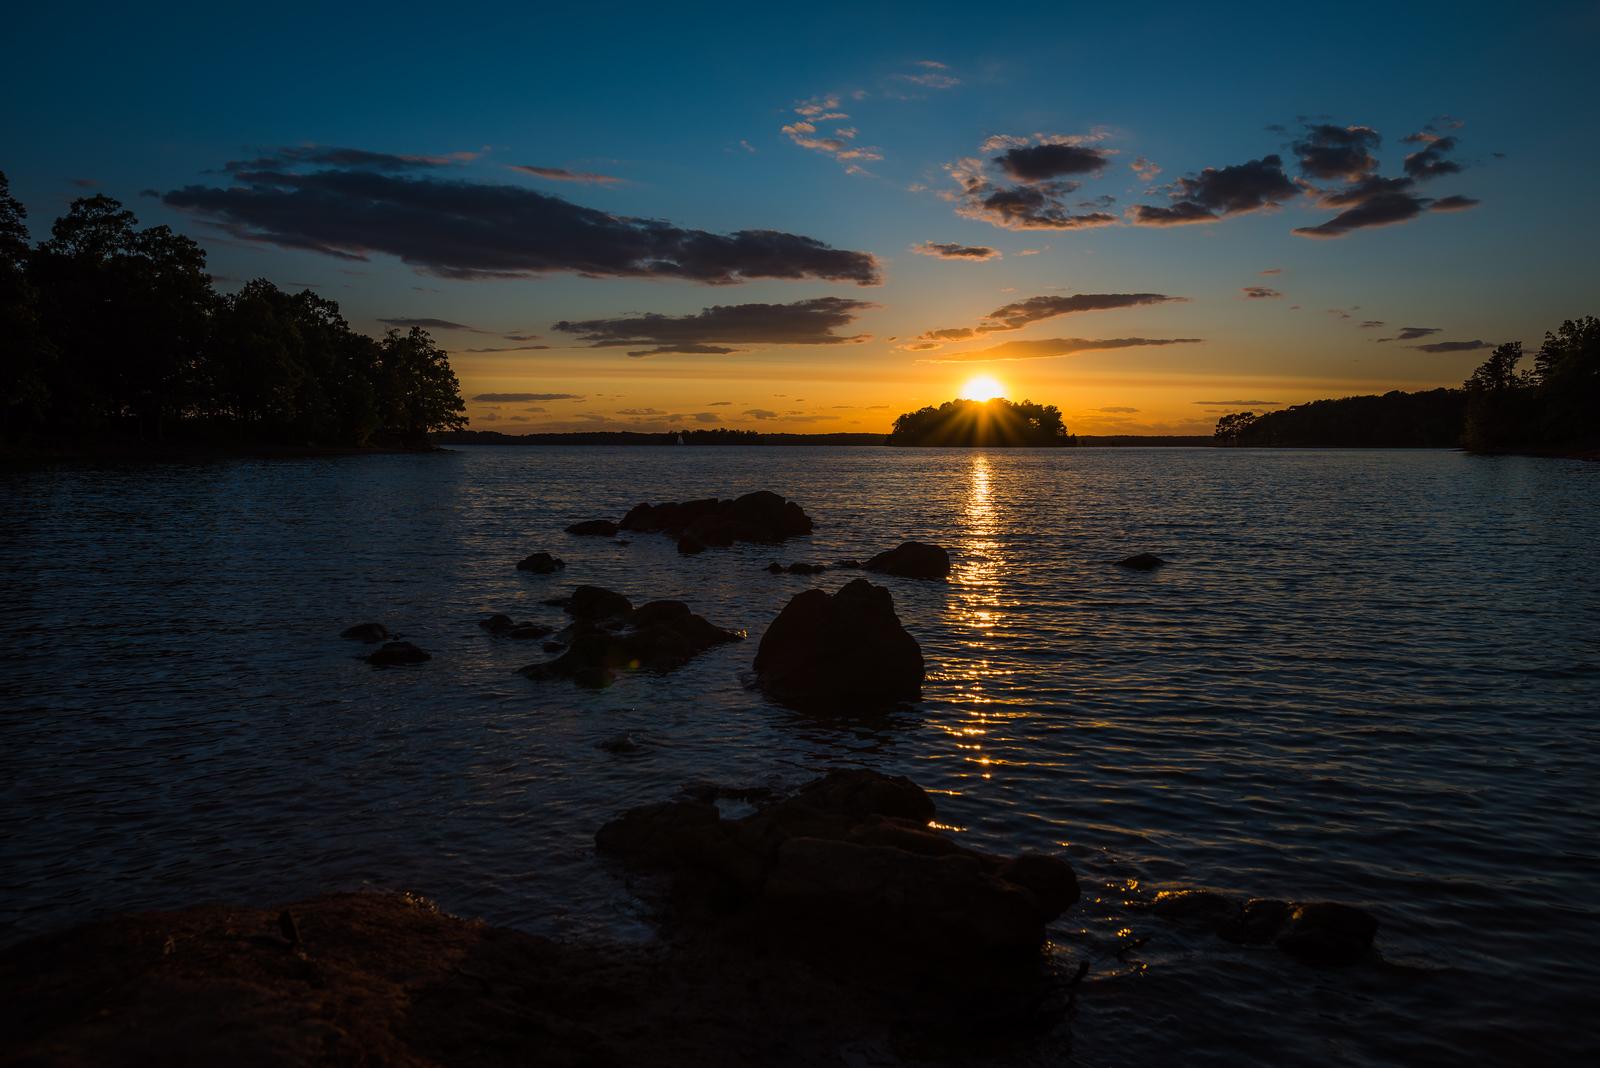 Sunset on Lake Hartwell